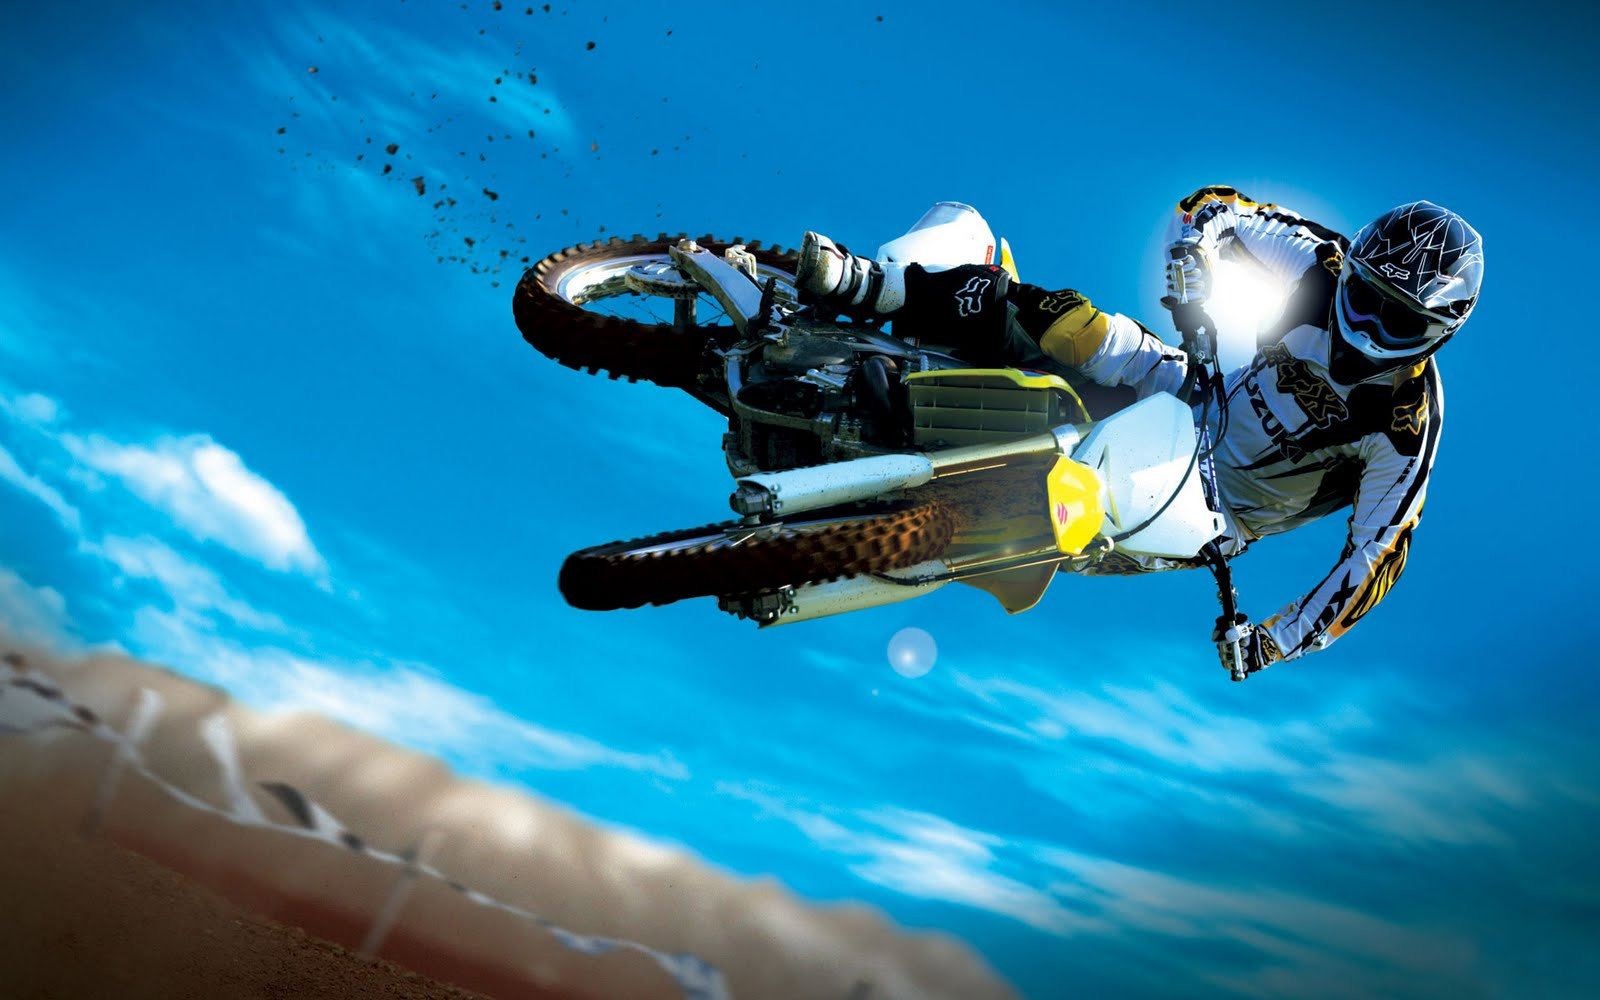 http://2.bp.blogspot.com/-bYh5D53u-nk/TlPm6Yi_eEI/AAAAAAAADq0/KULDTRe_WXI/s1600/amazing_wallpapers_motocross_motor_bike.jpg